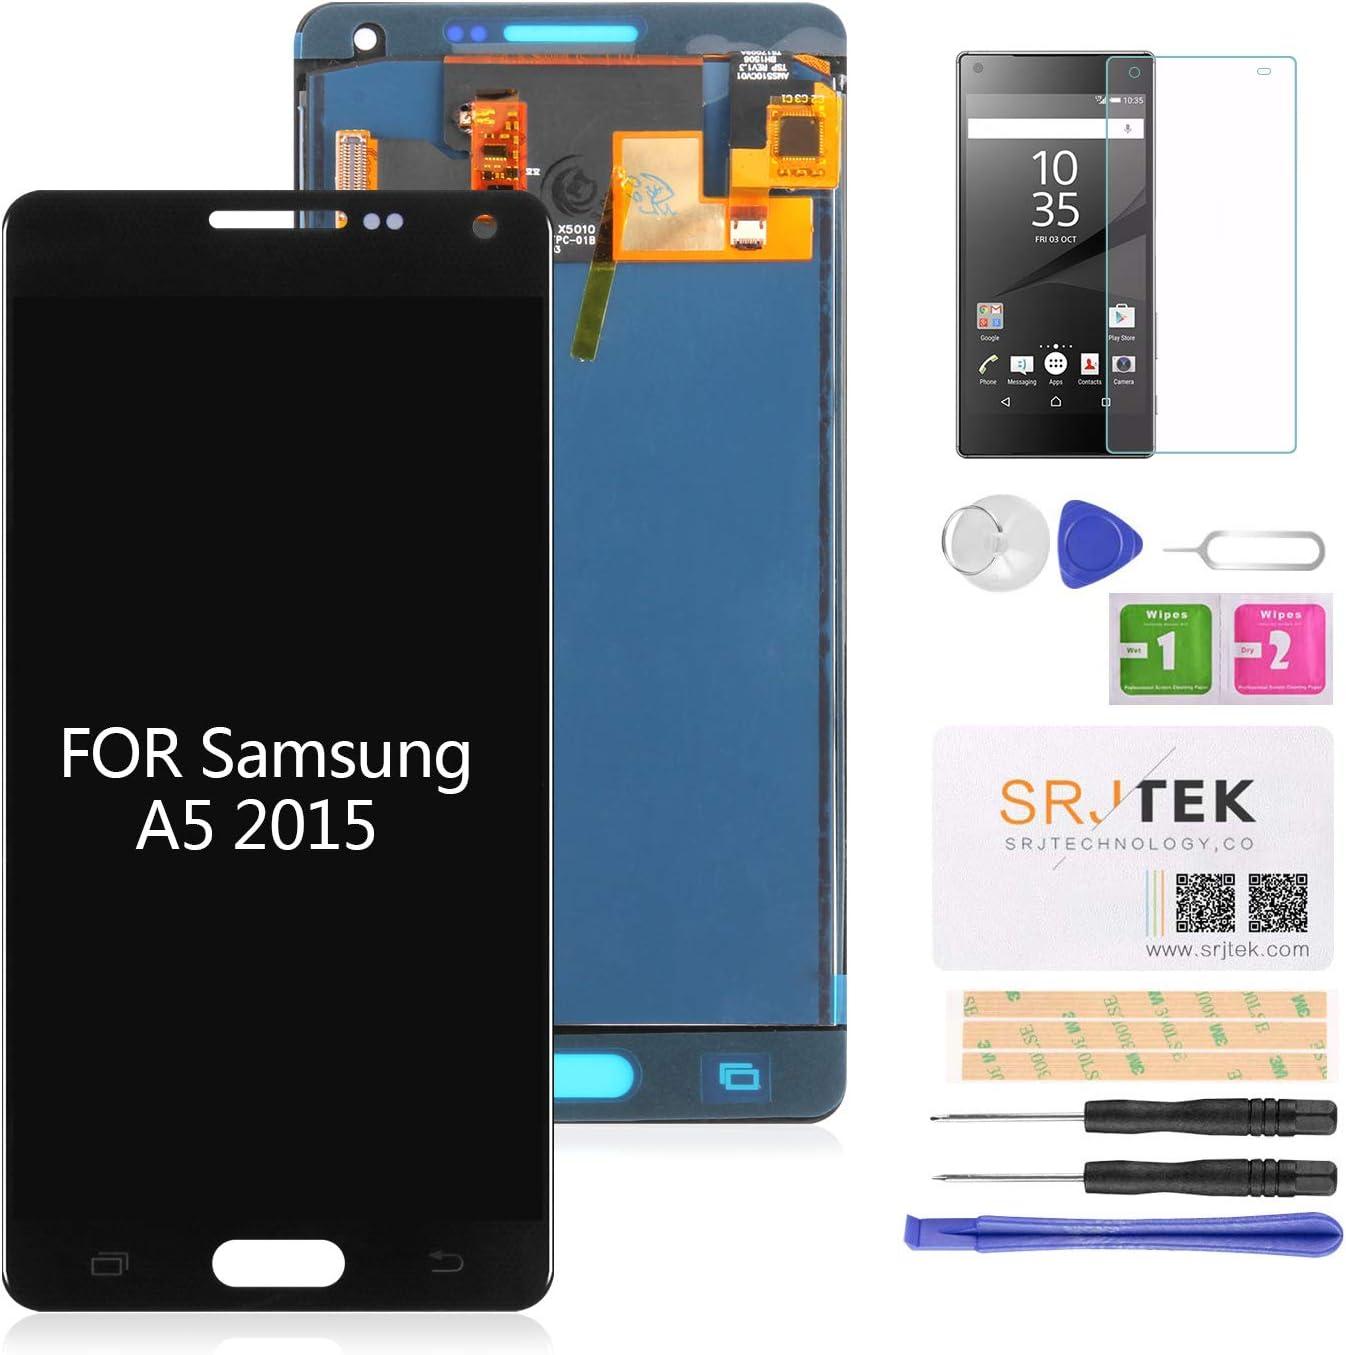 srjtek TFT LCD pantalla táctil de repuesto para Samsung Galaxy A5 ...